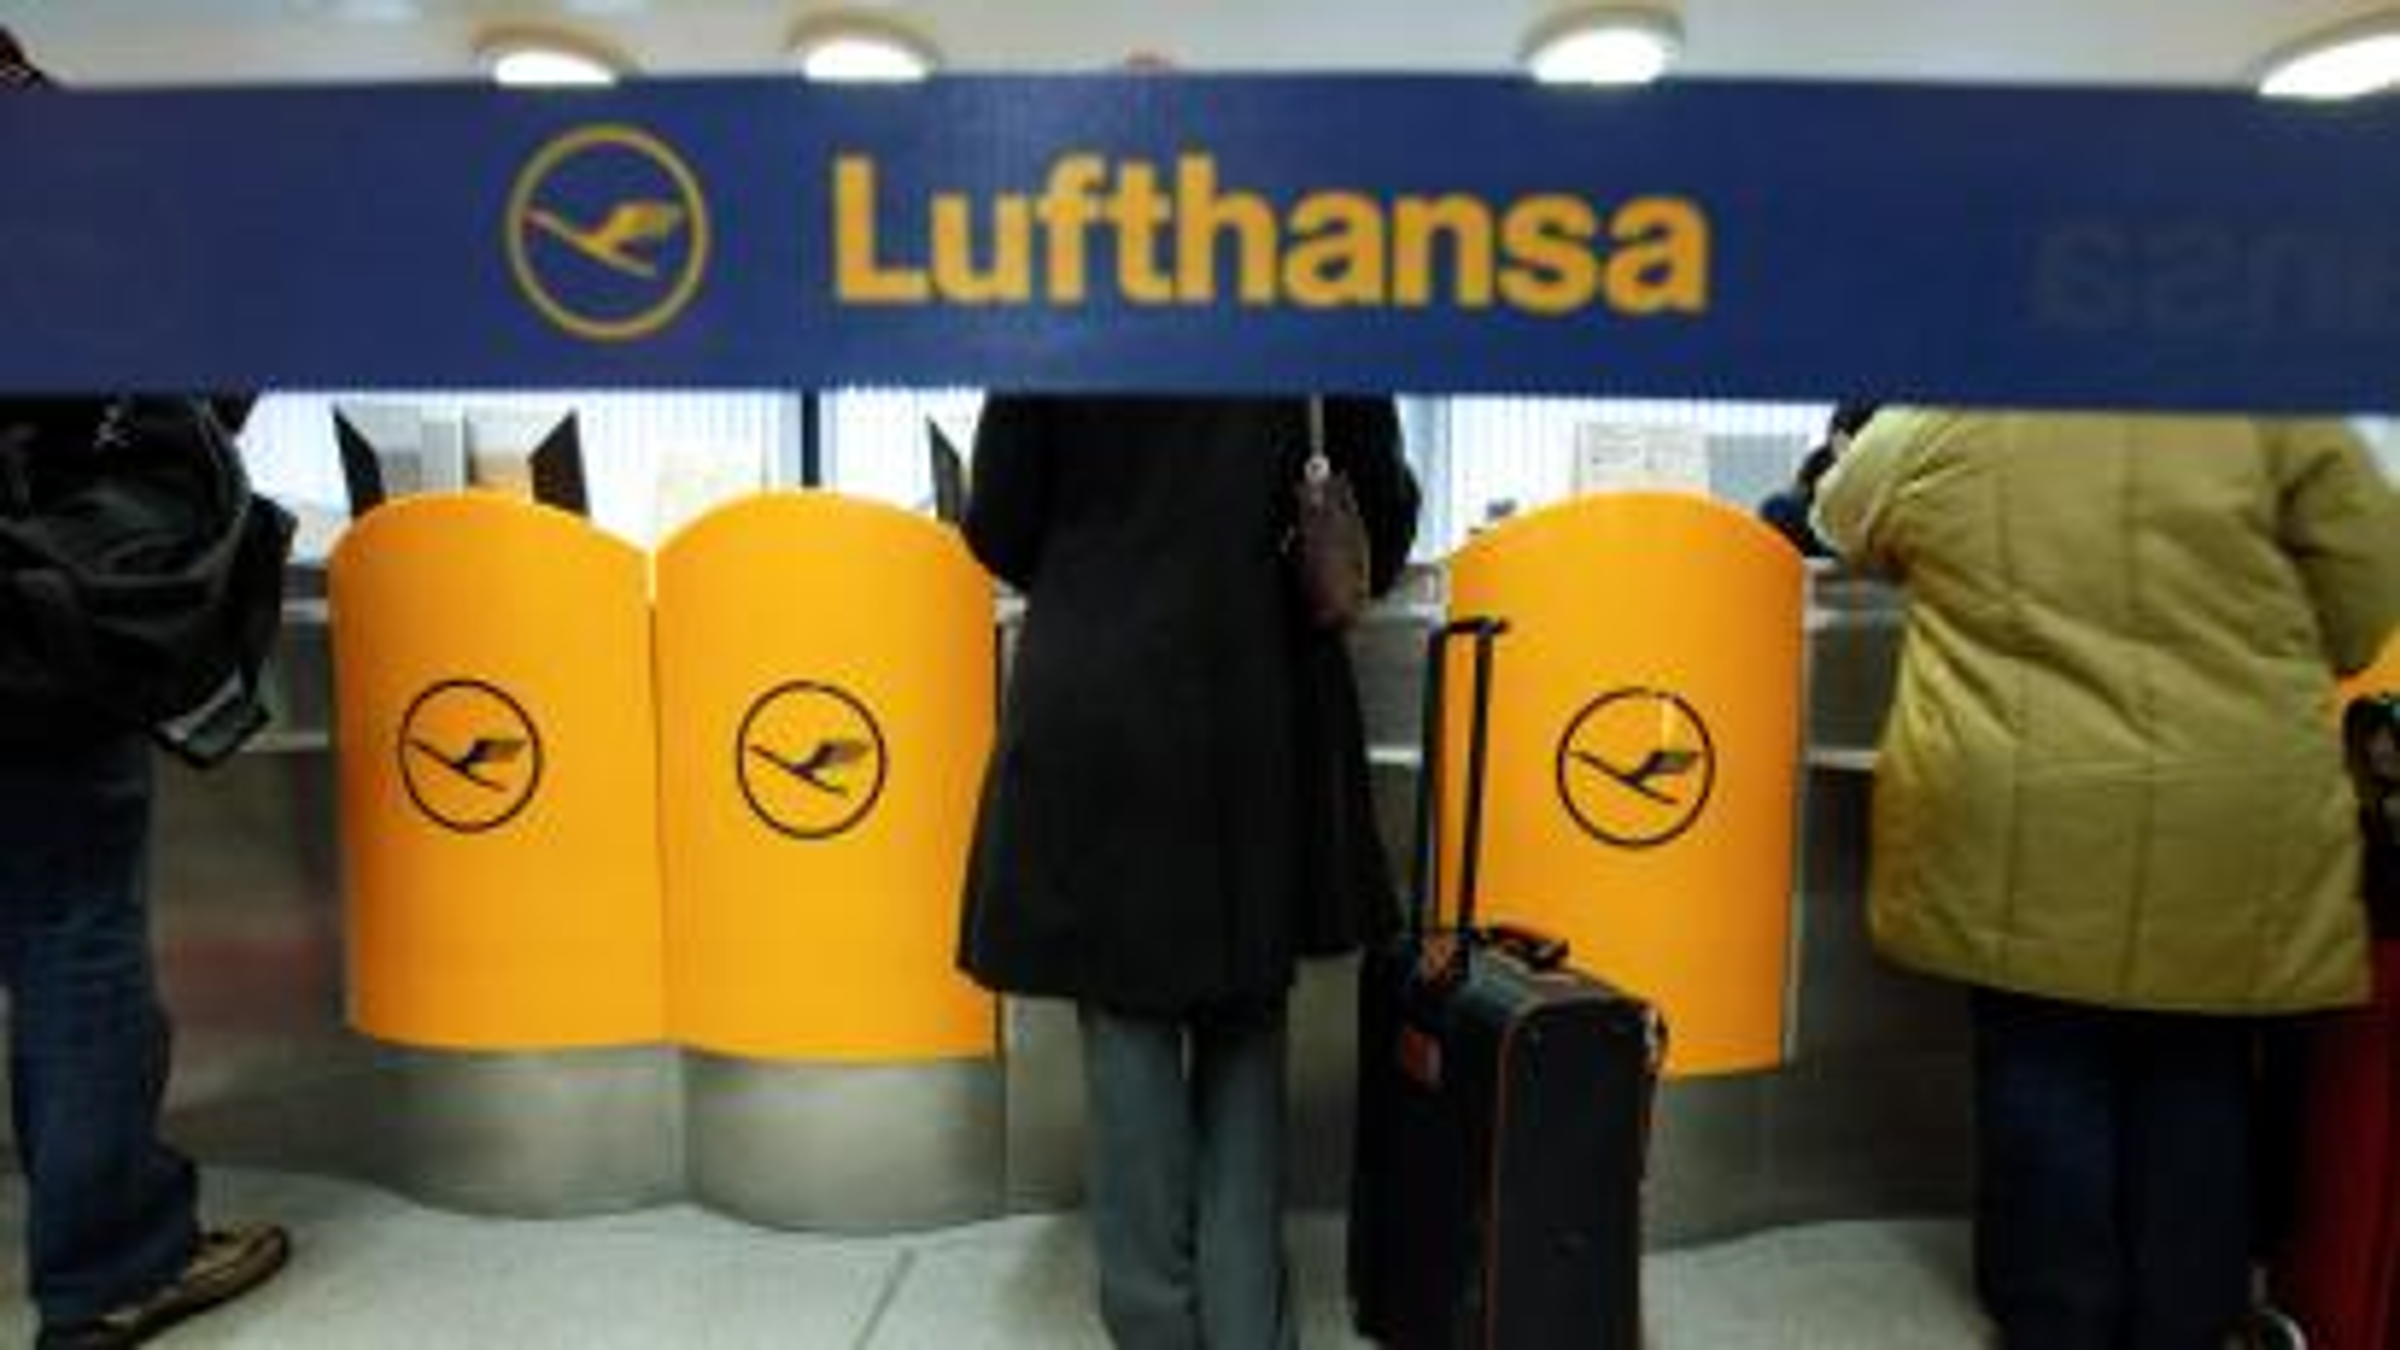 Lufthansa Germany immigration